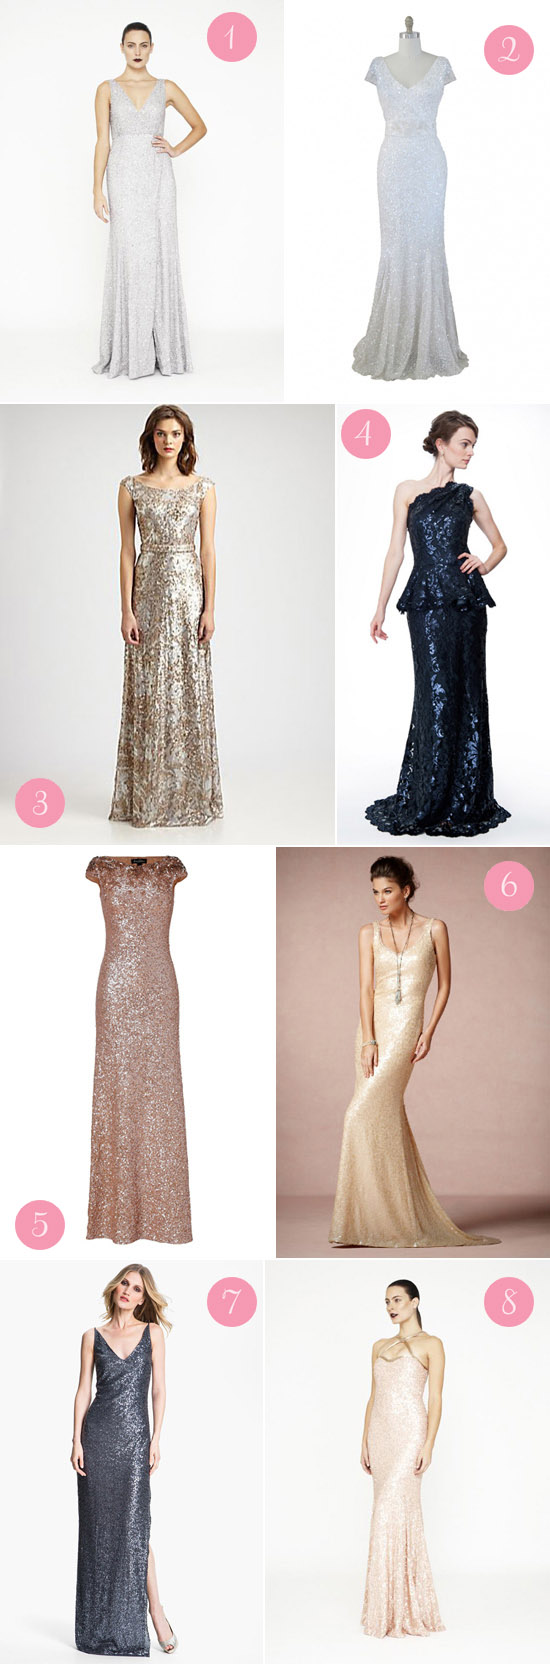 sequin wedding gowns Sequin Wedding Gowns